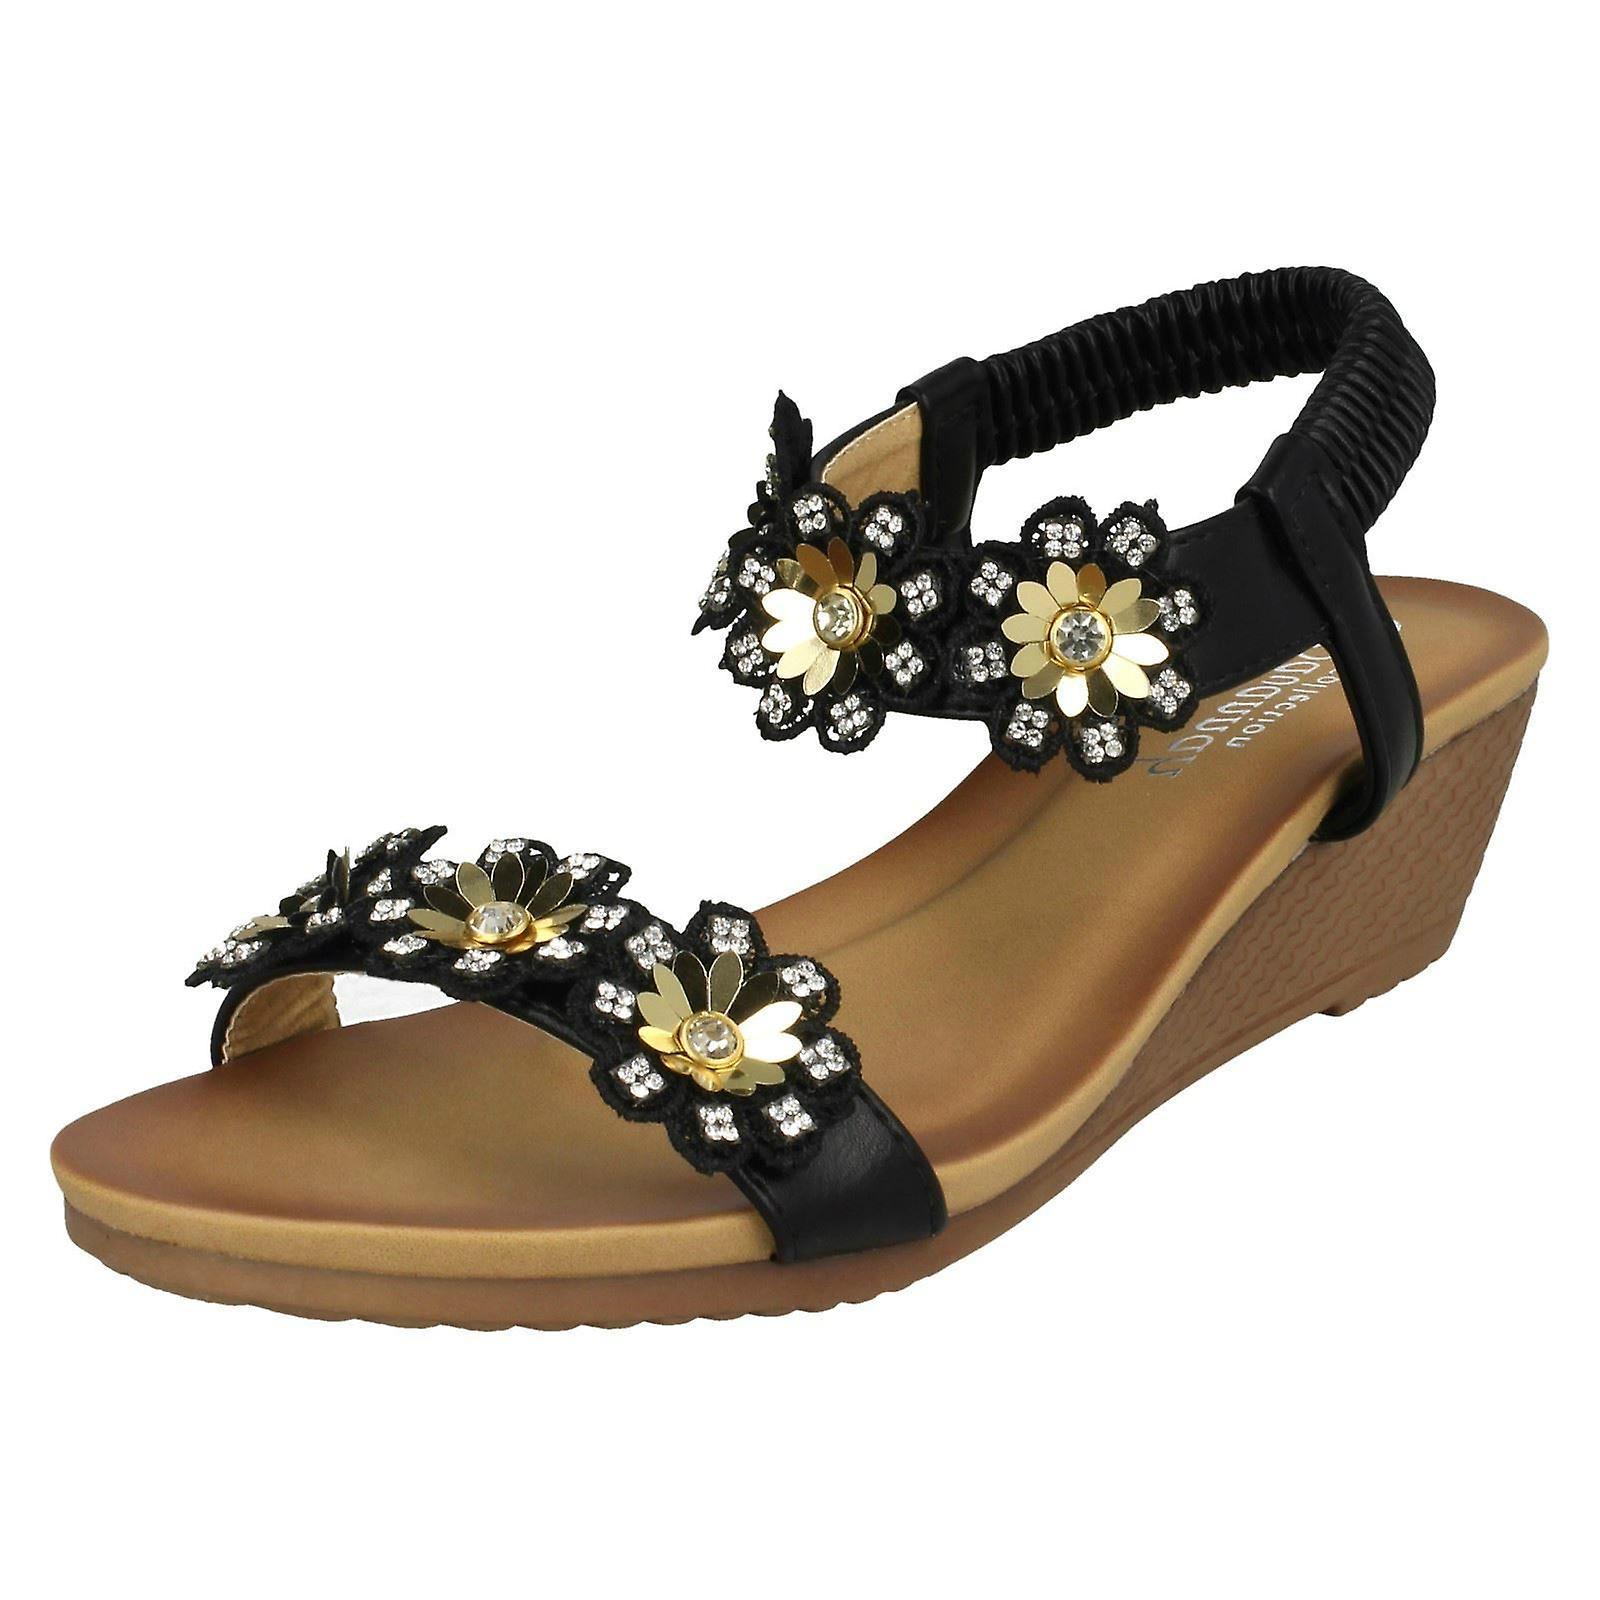 Ladies Savannah Mid Wedge Sandals F10789 - Black Synthetic - UK Size 4 - EU Size 37 - US Size 6